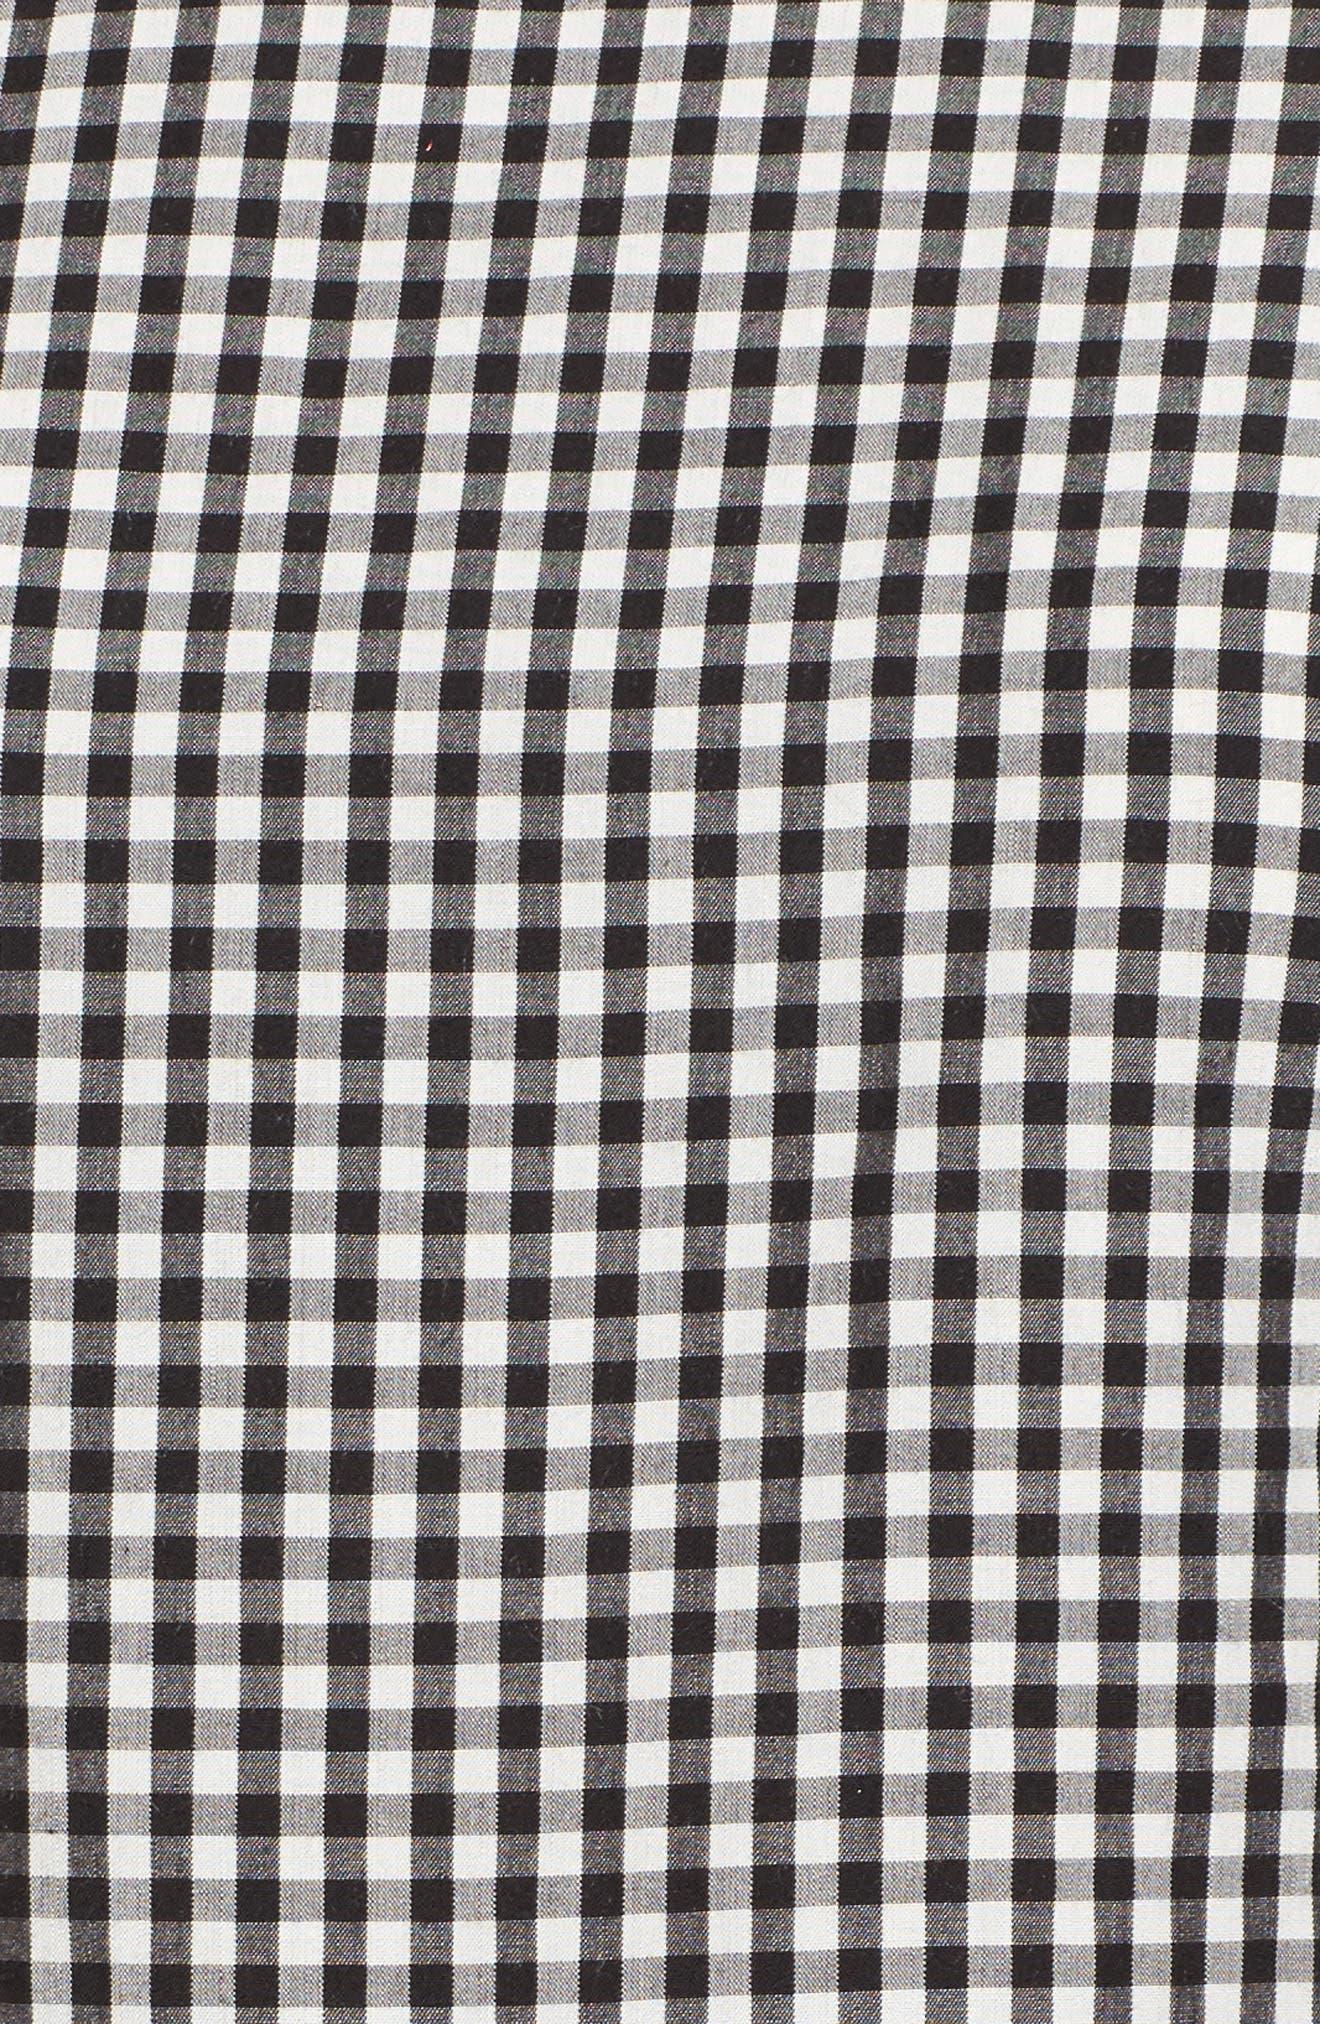 High/Low Peplum Top,                             Alternate thumbnail 5, color,                             Black- White Gingham